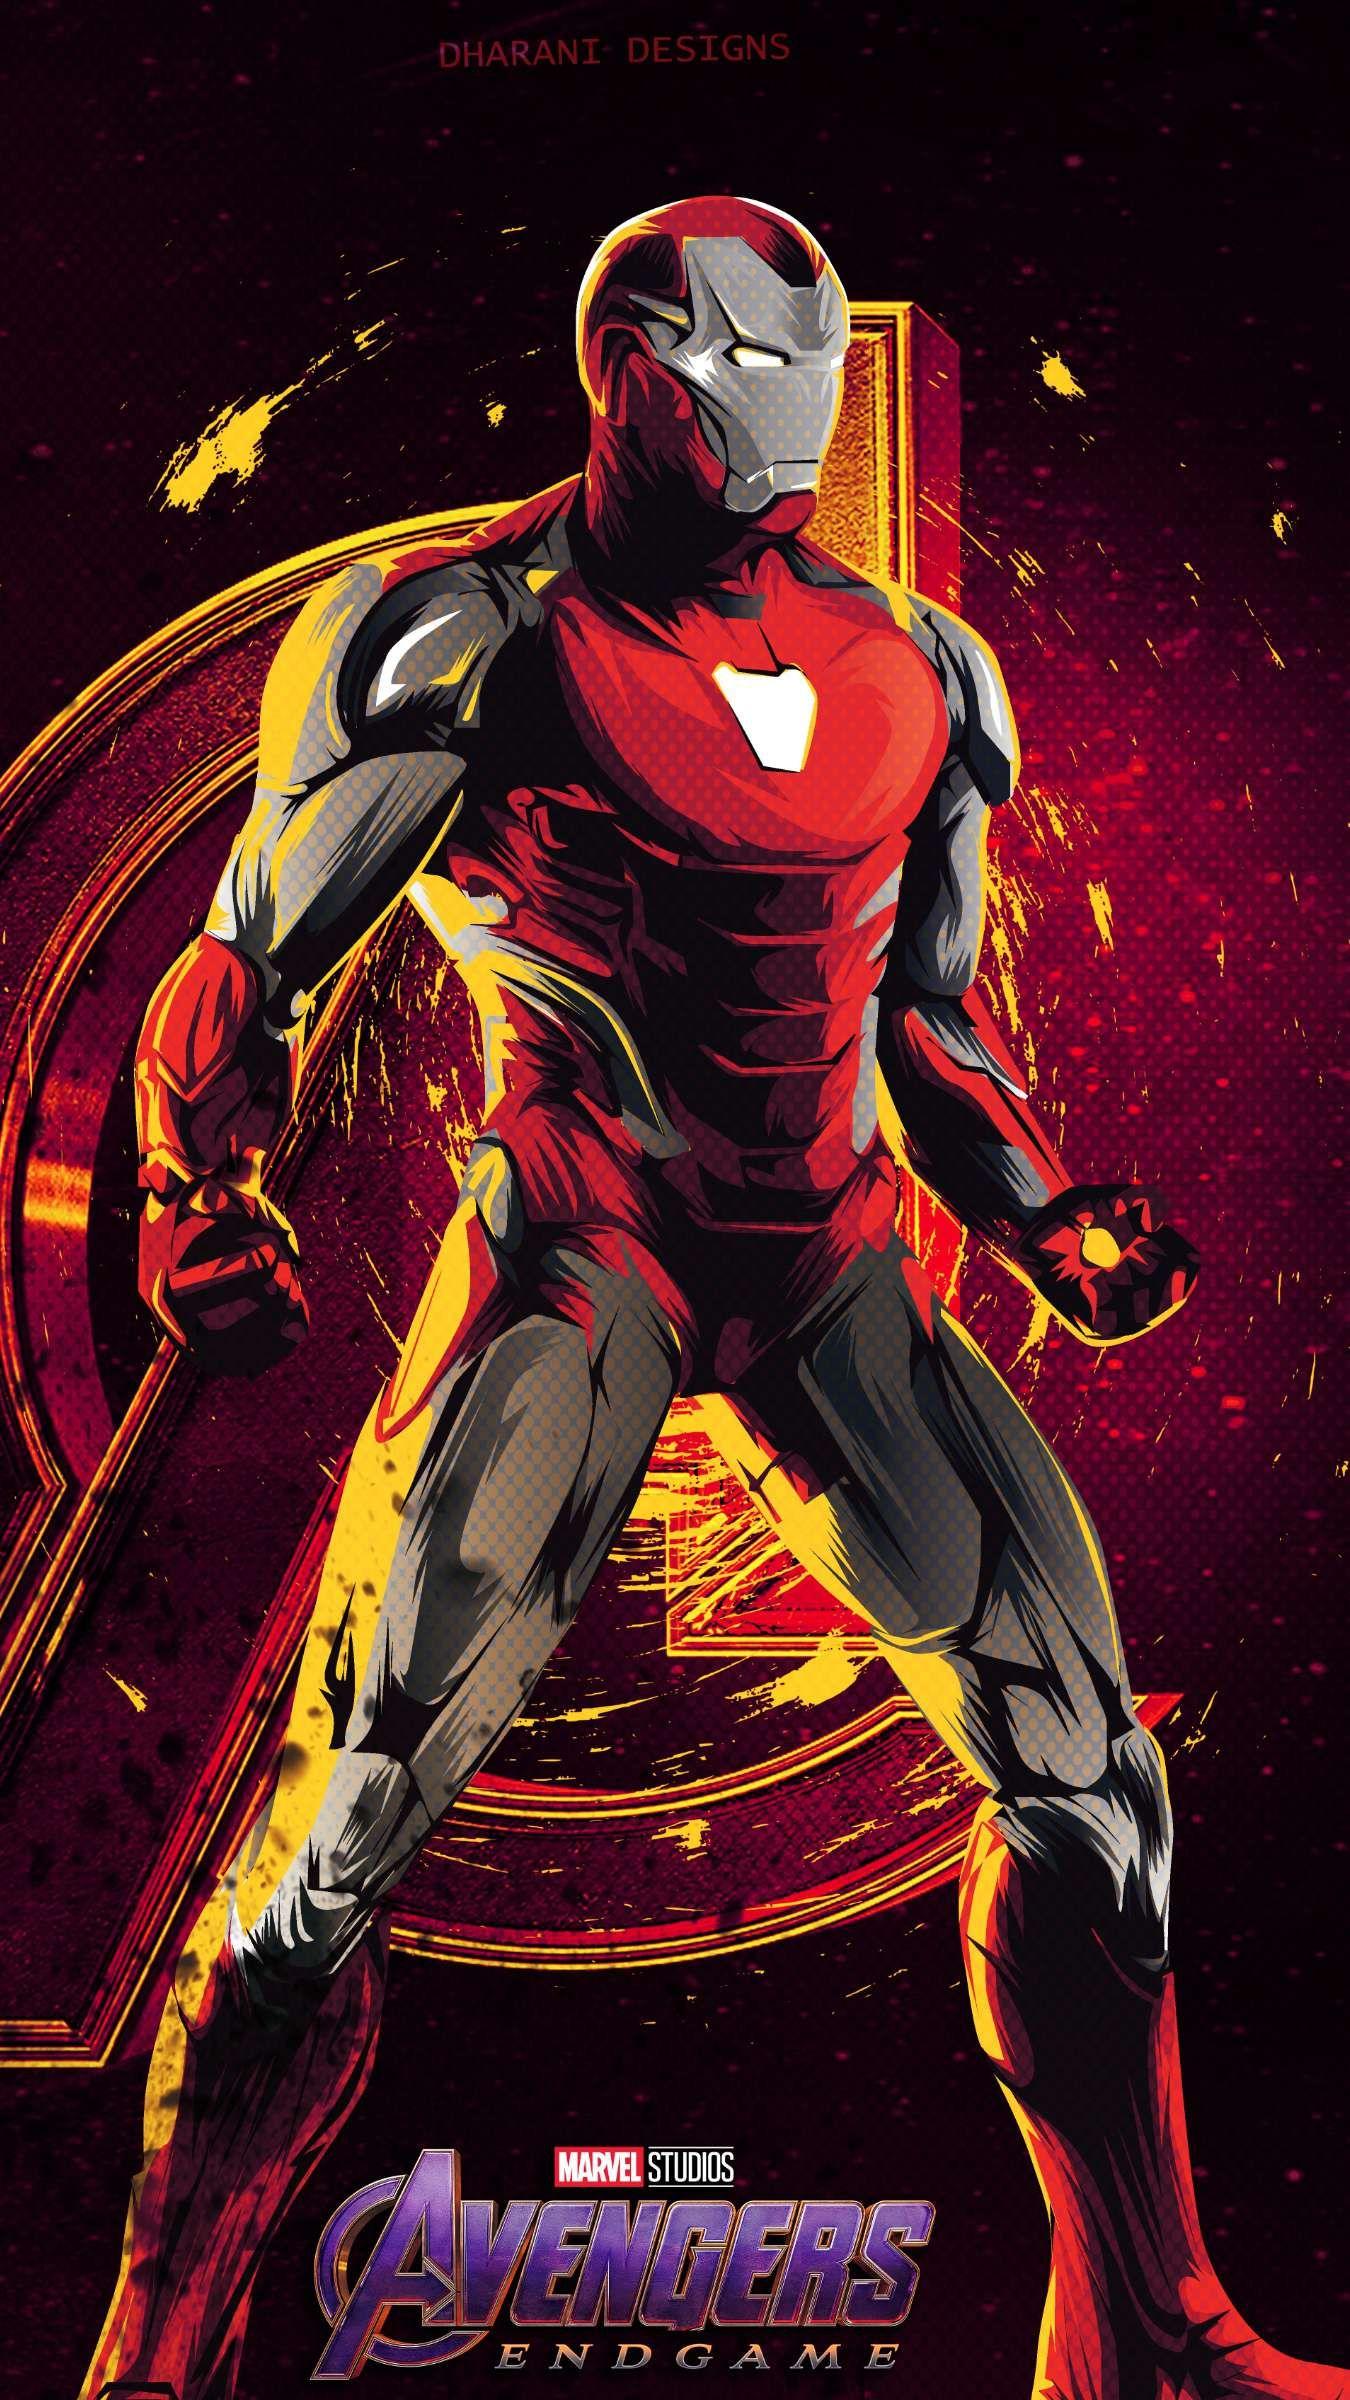 Iron Man Avengers Endgame Mk 85 Armor Iphone Wallpaper Iron Man